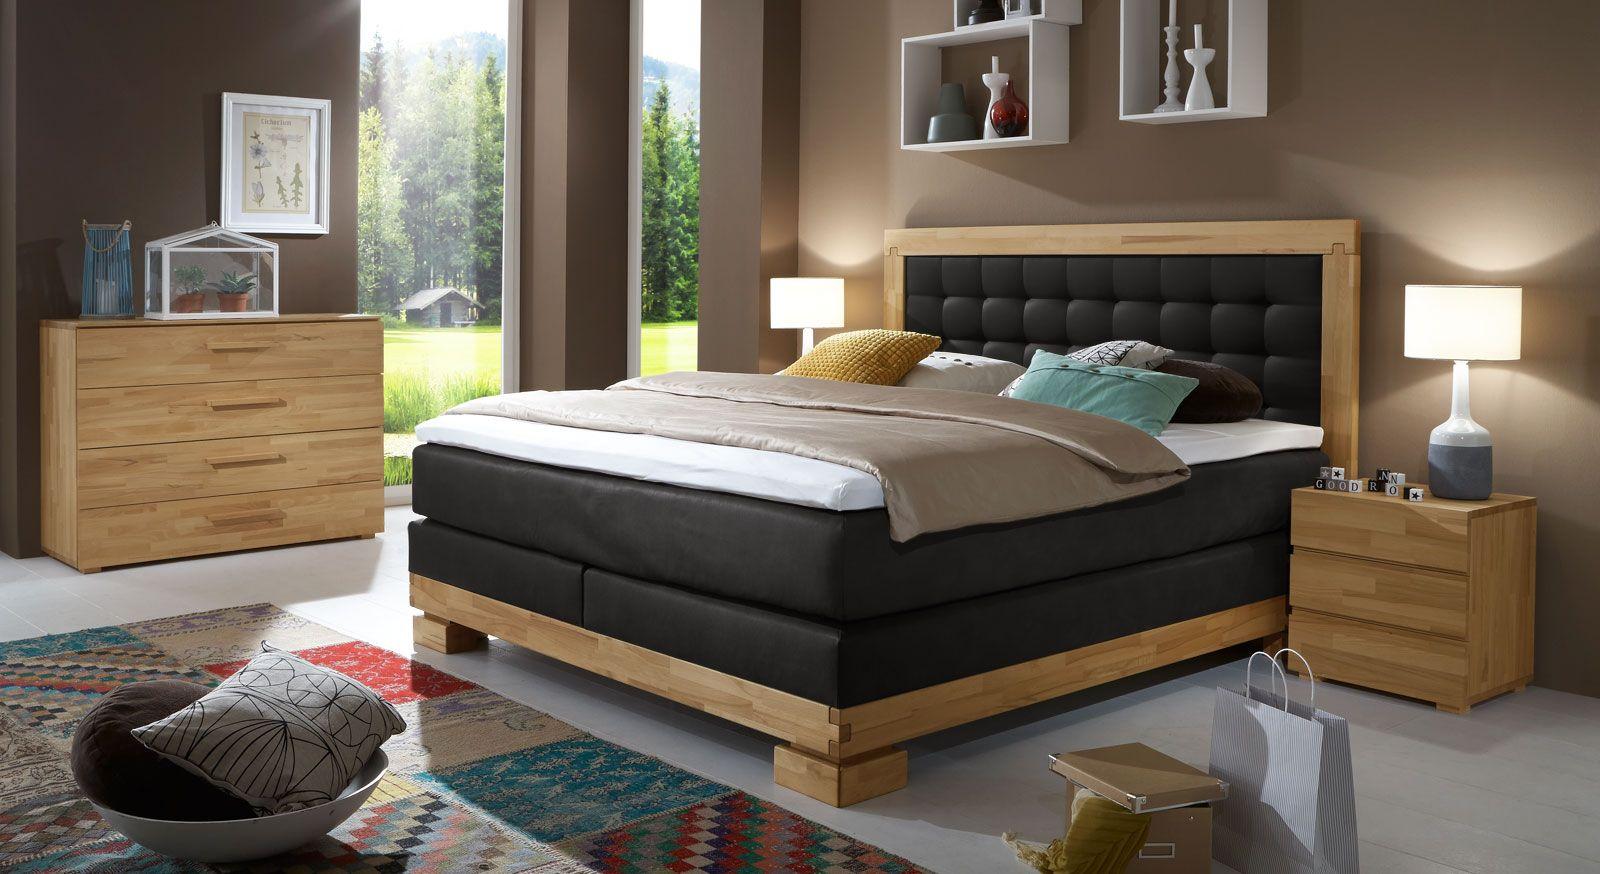 nice schlafzimmer boxspringbett gunstig #1: Billig schlafzimmer komplett günstig mit boxspringbett